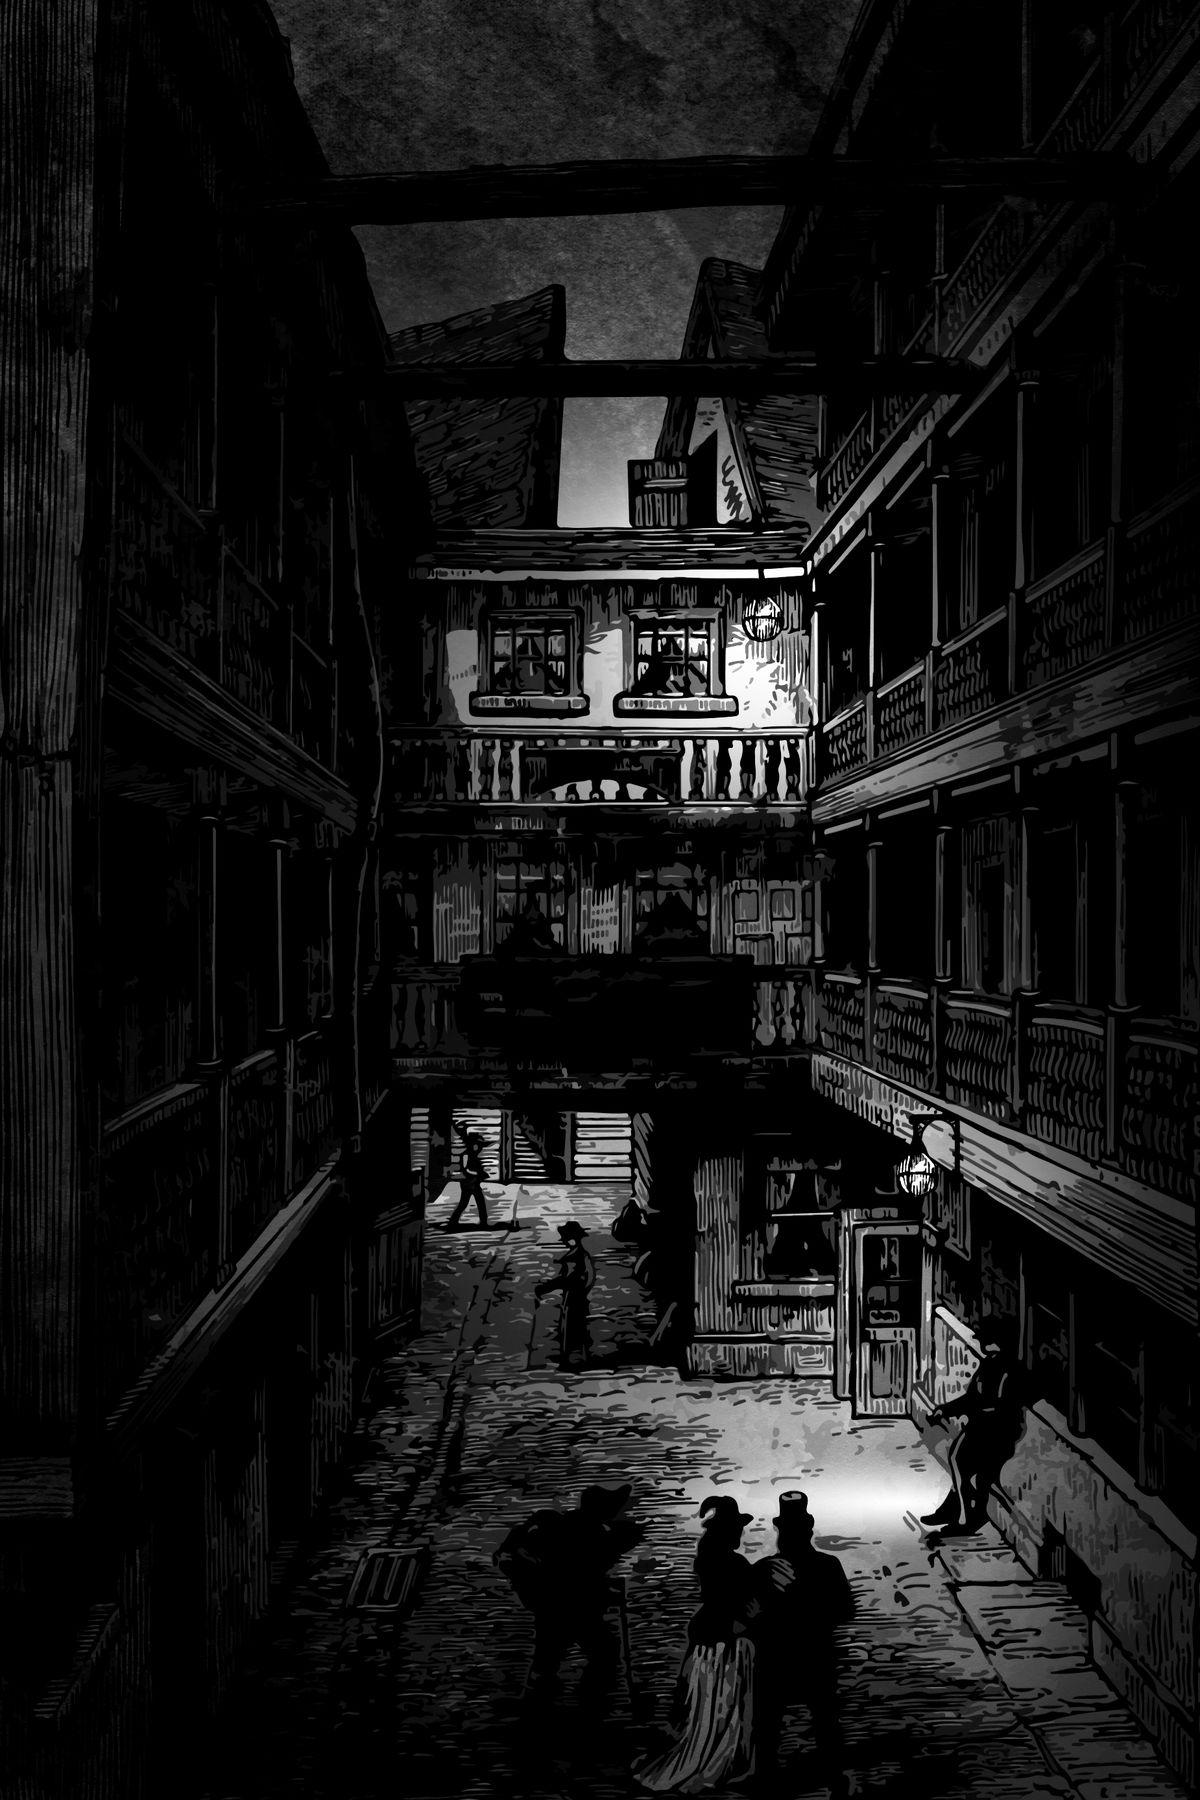 A narrow street at dusk, lit by two wan gas lamps. Frocked people dot the street below.